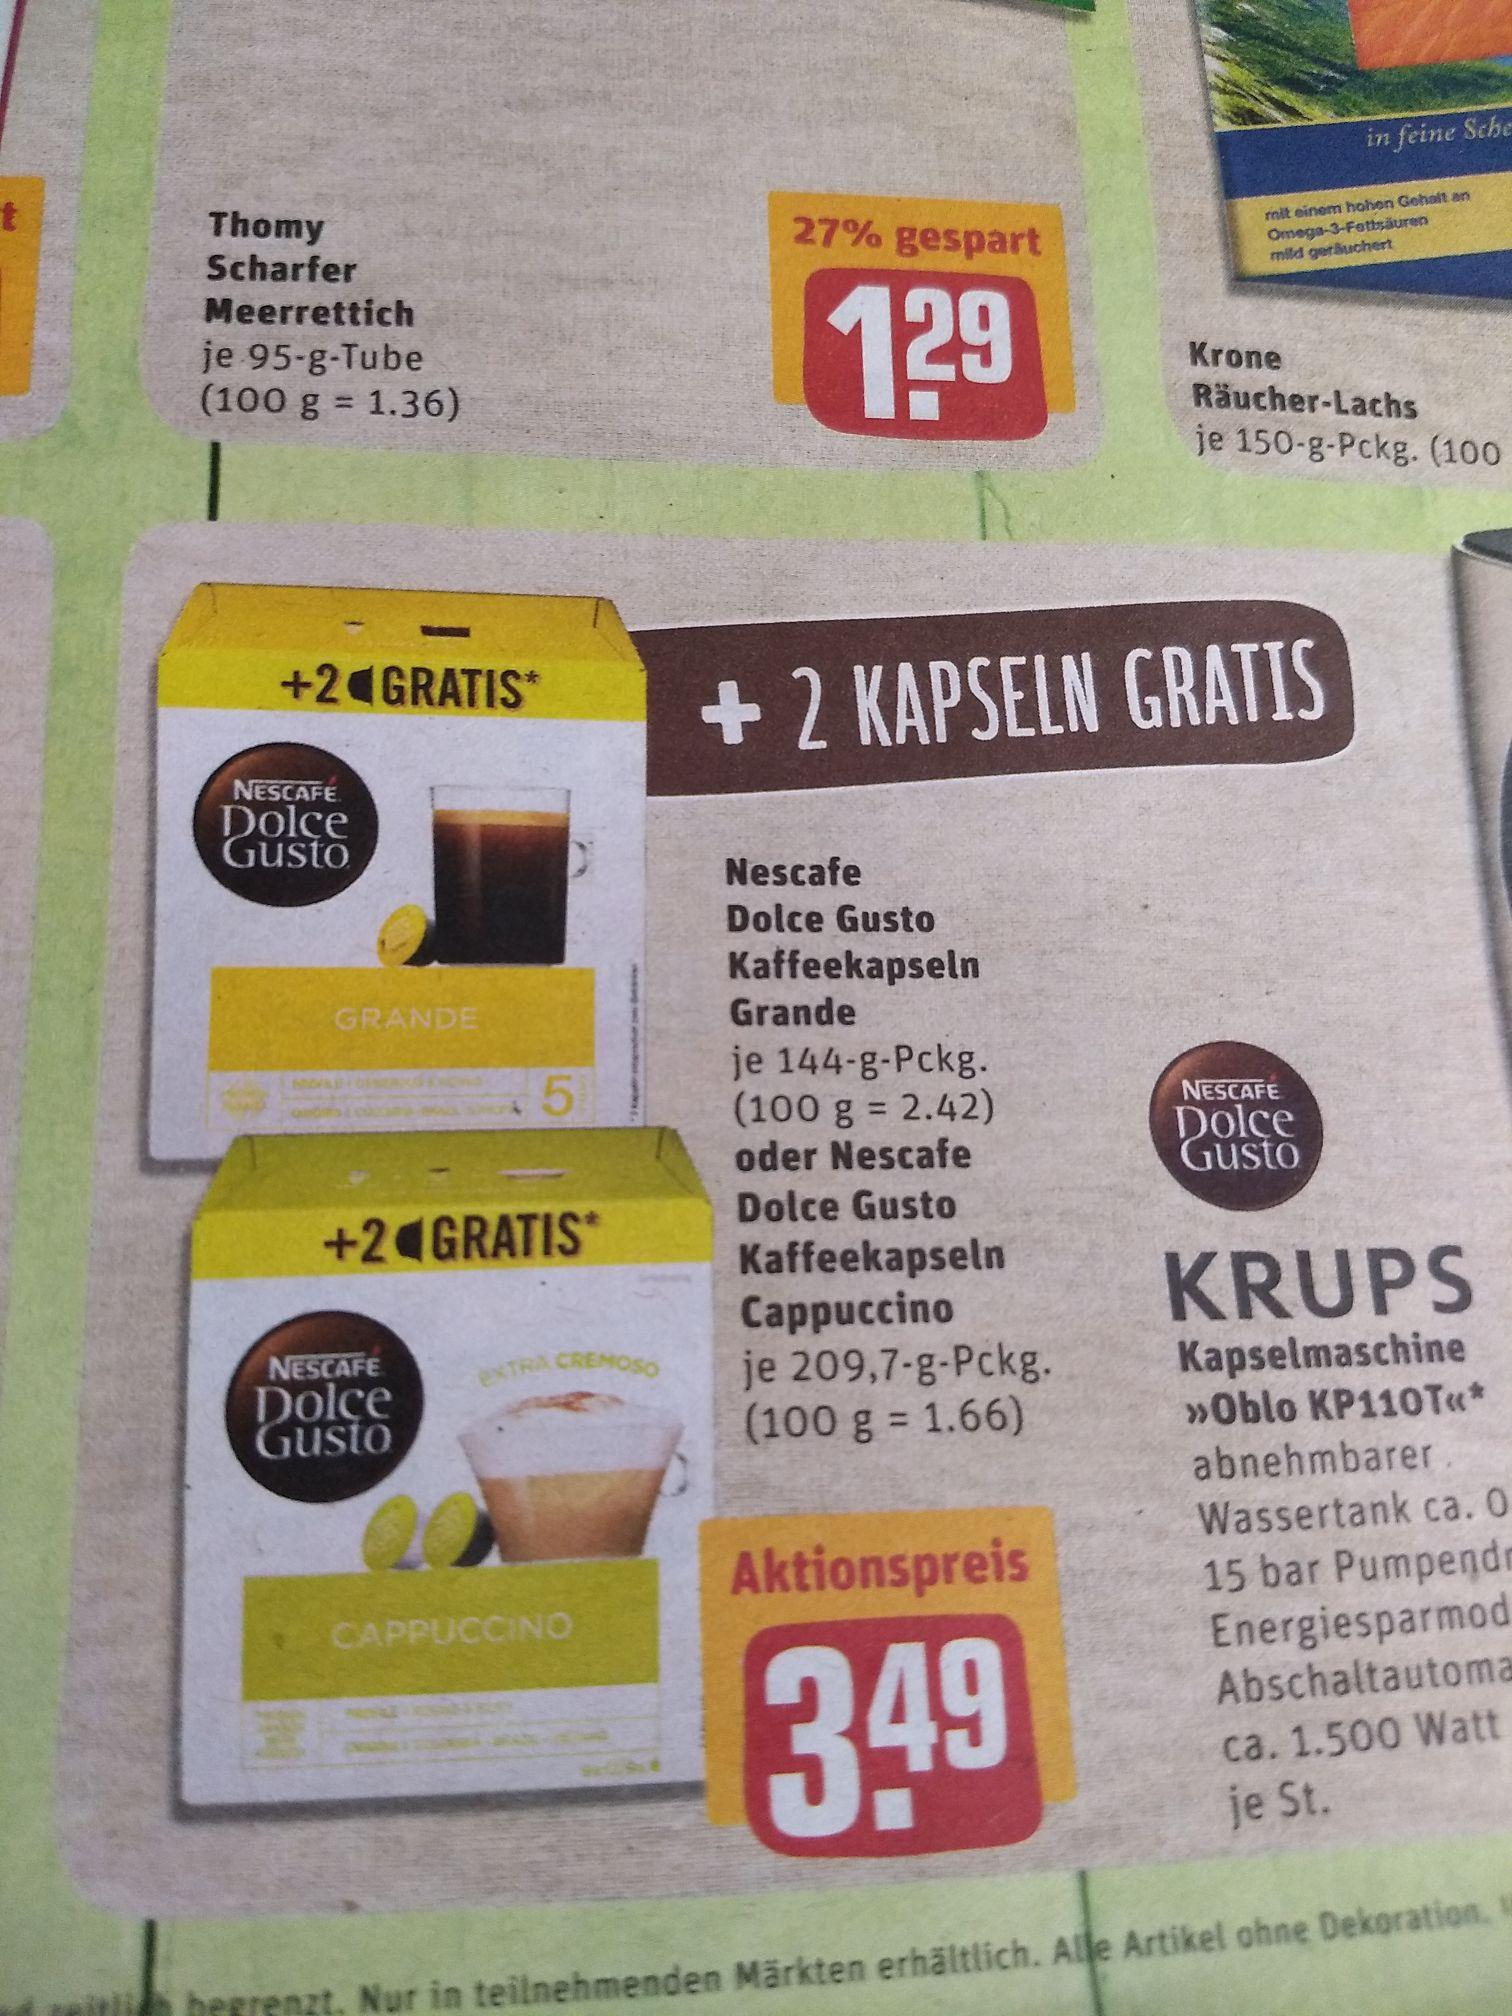 [REWE] Nescafe Dolce Gusto Kapseln